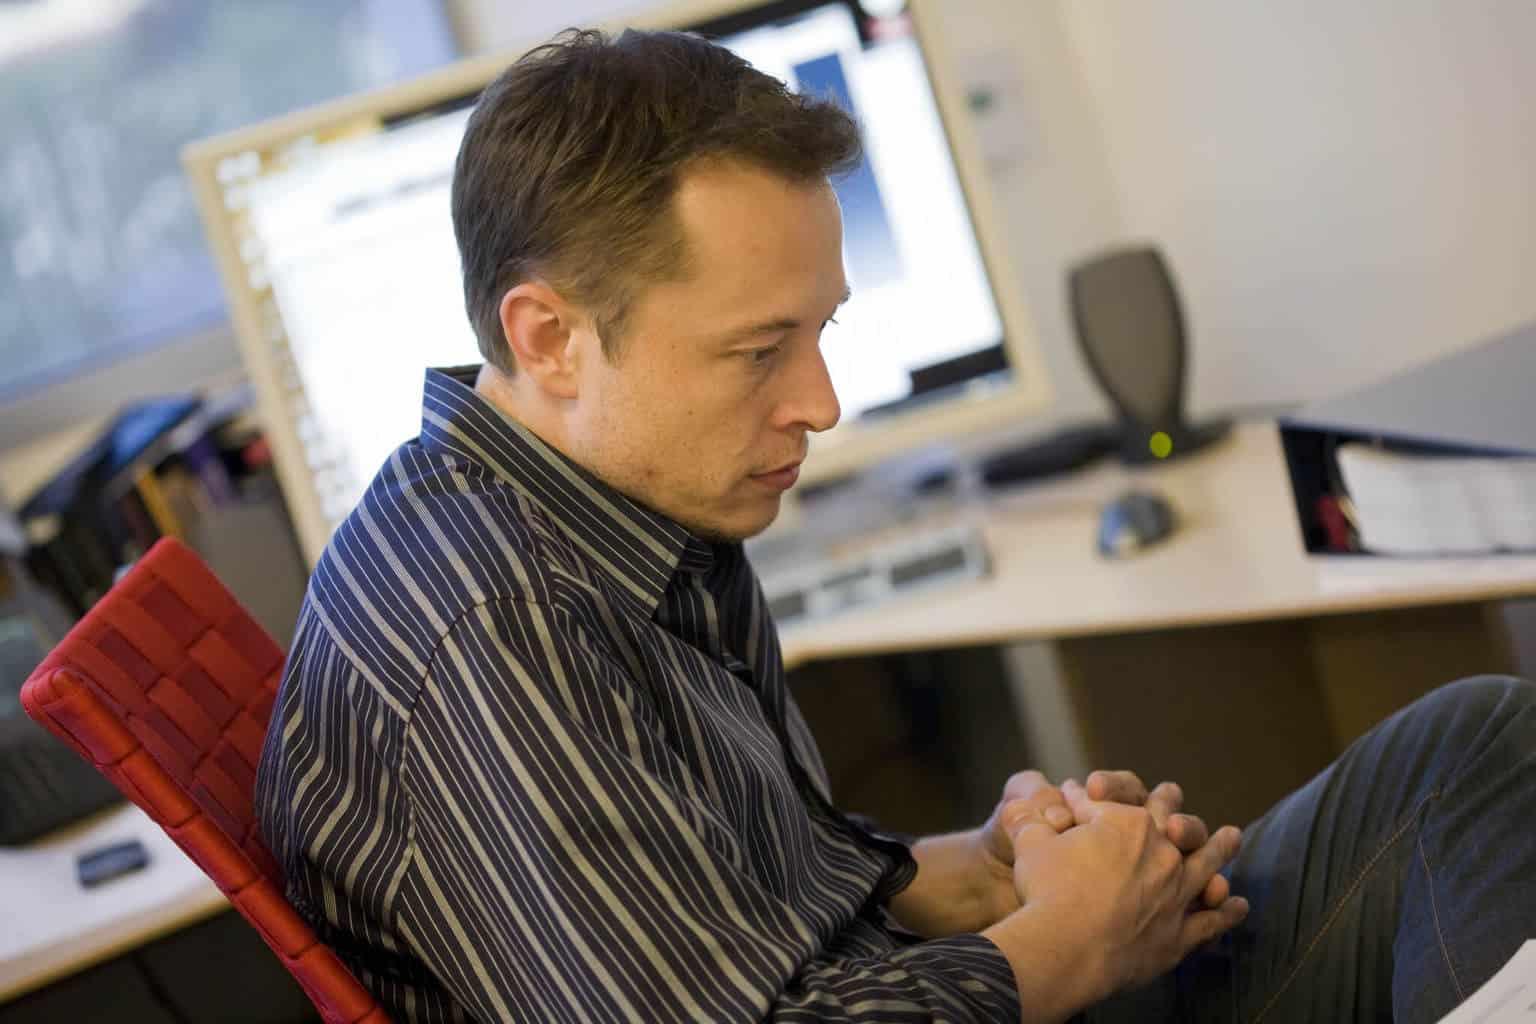 Elon Musk Tesla Motors Inc (TSLA) and SolarCity Corp (SCTY)